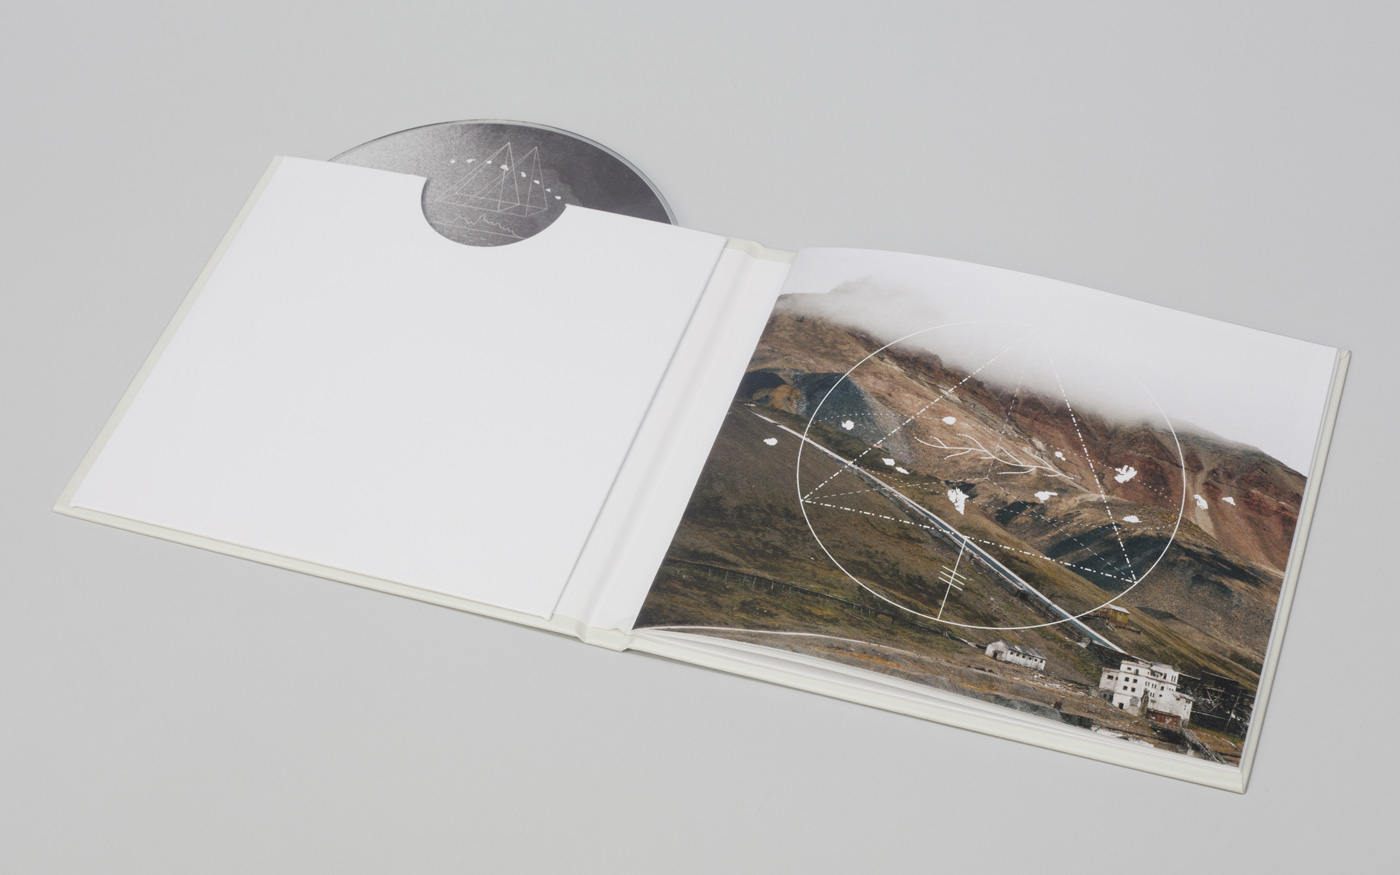 Piramida-Booklet-02-1400px.jpg